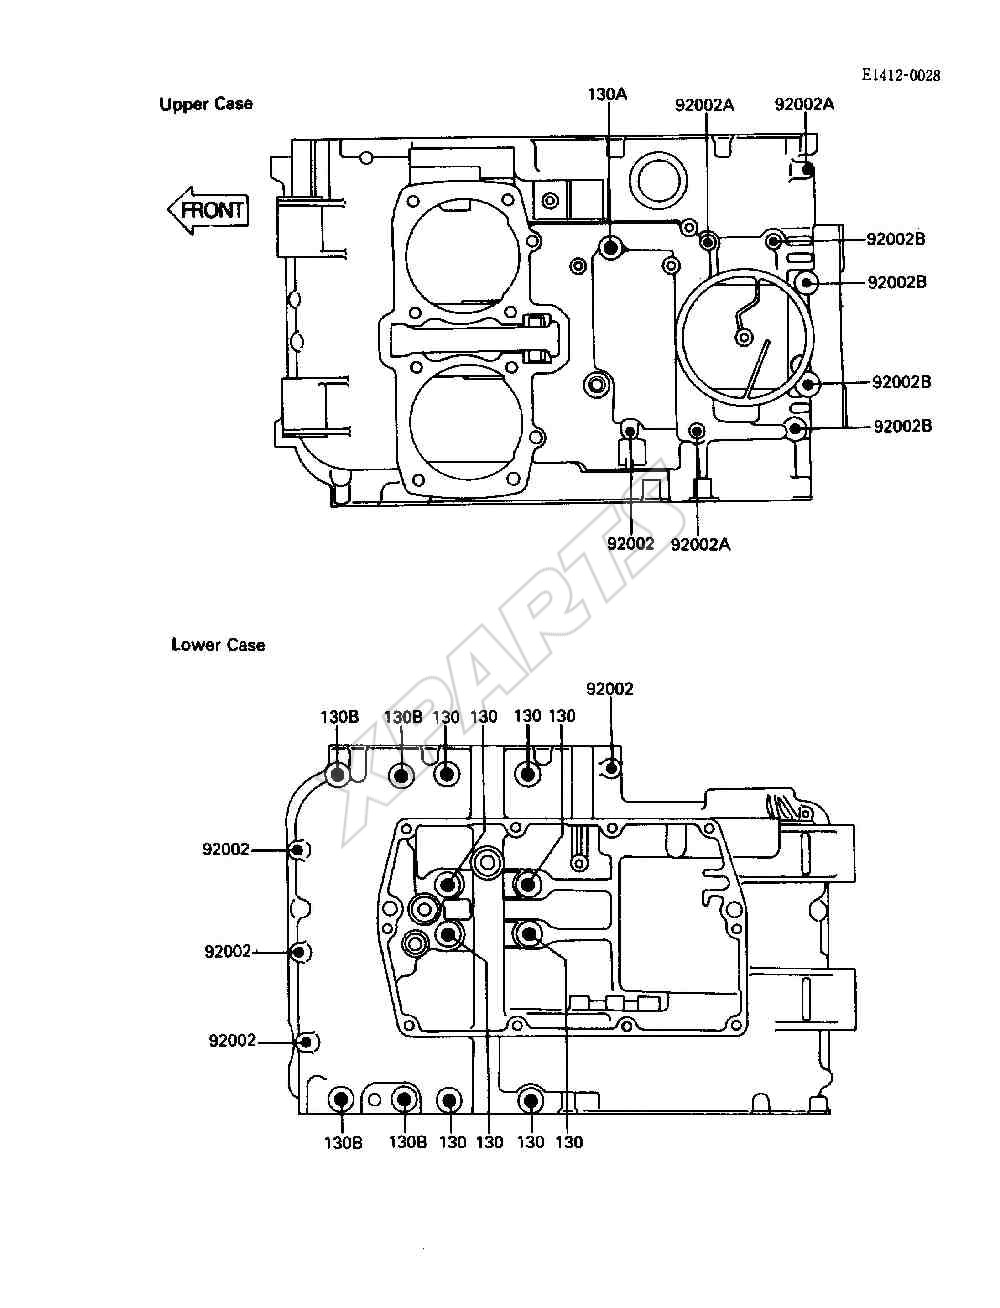 Kawasaki 454 LTD (EN450-A2) Crankcase Bolt Pattern (1986